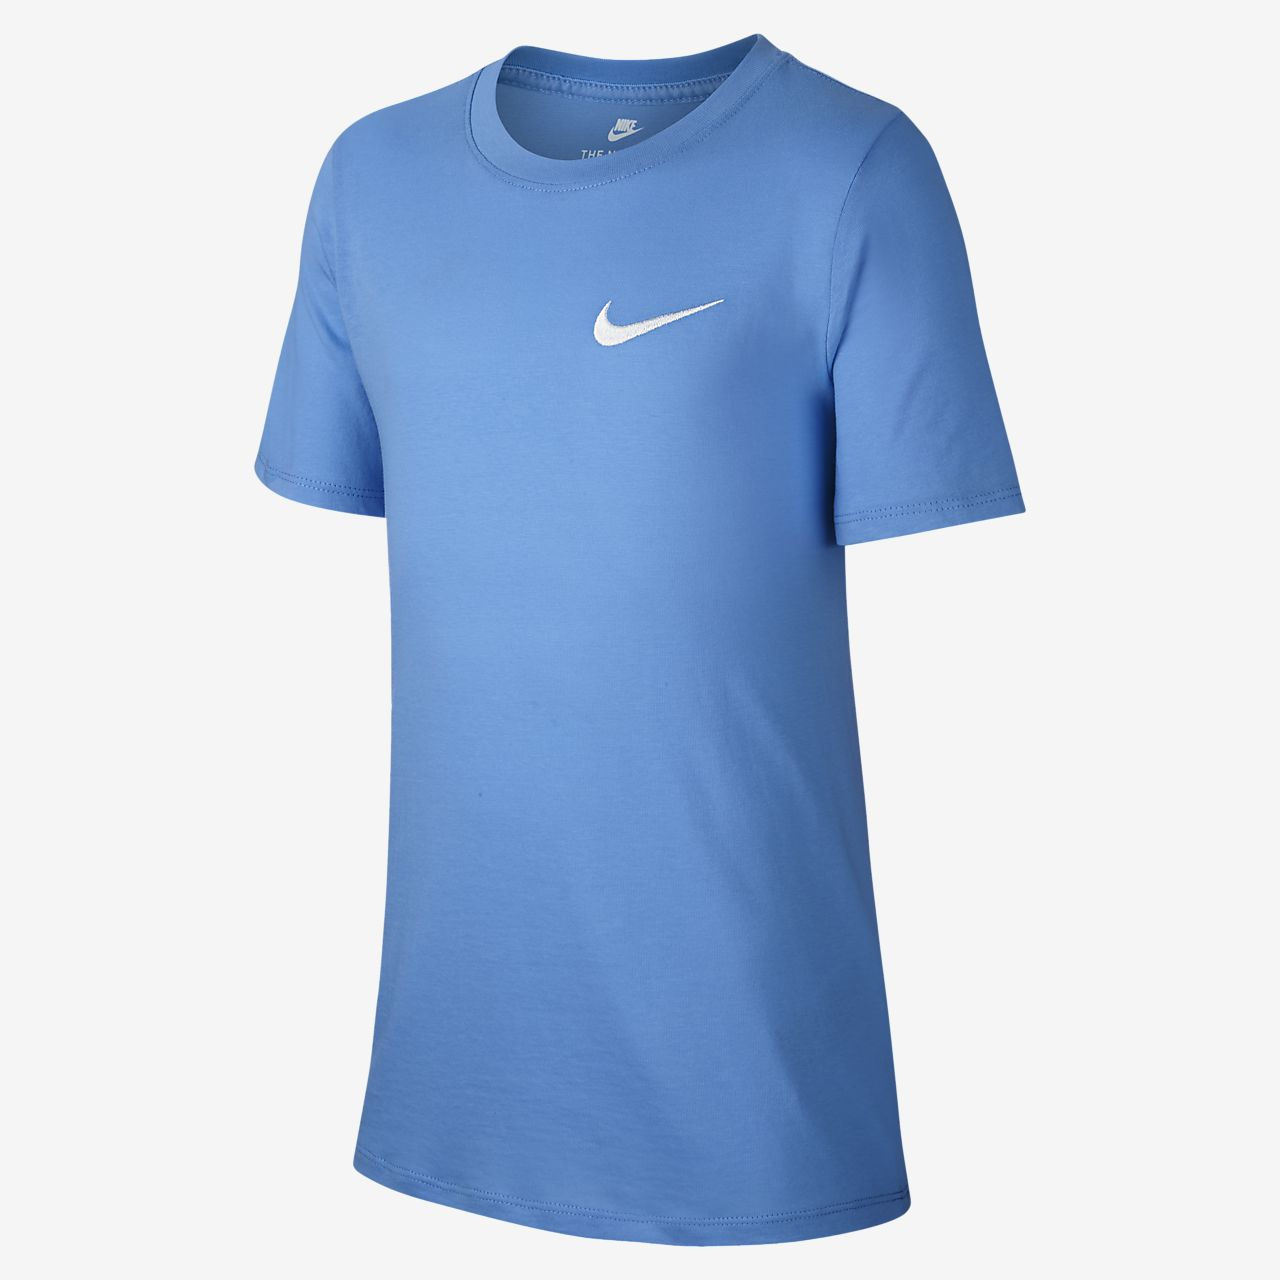 Nike Sportswear Boys' T-Shirt